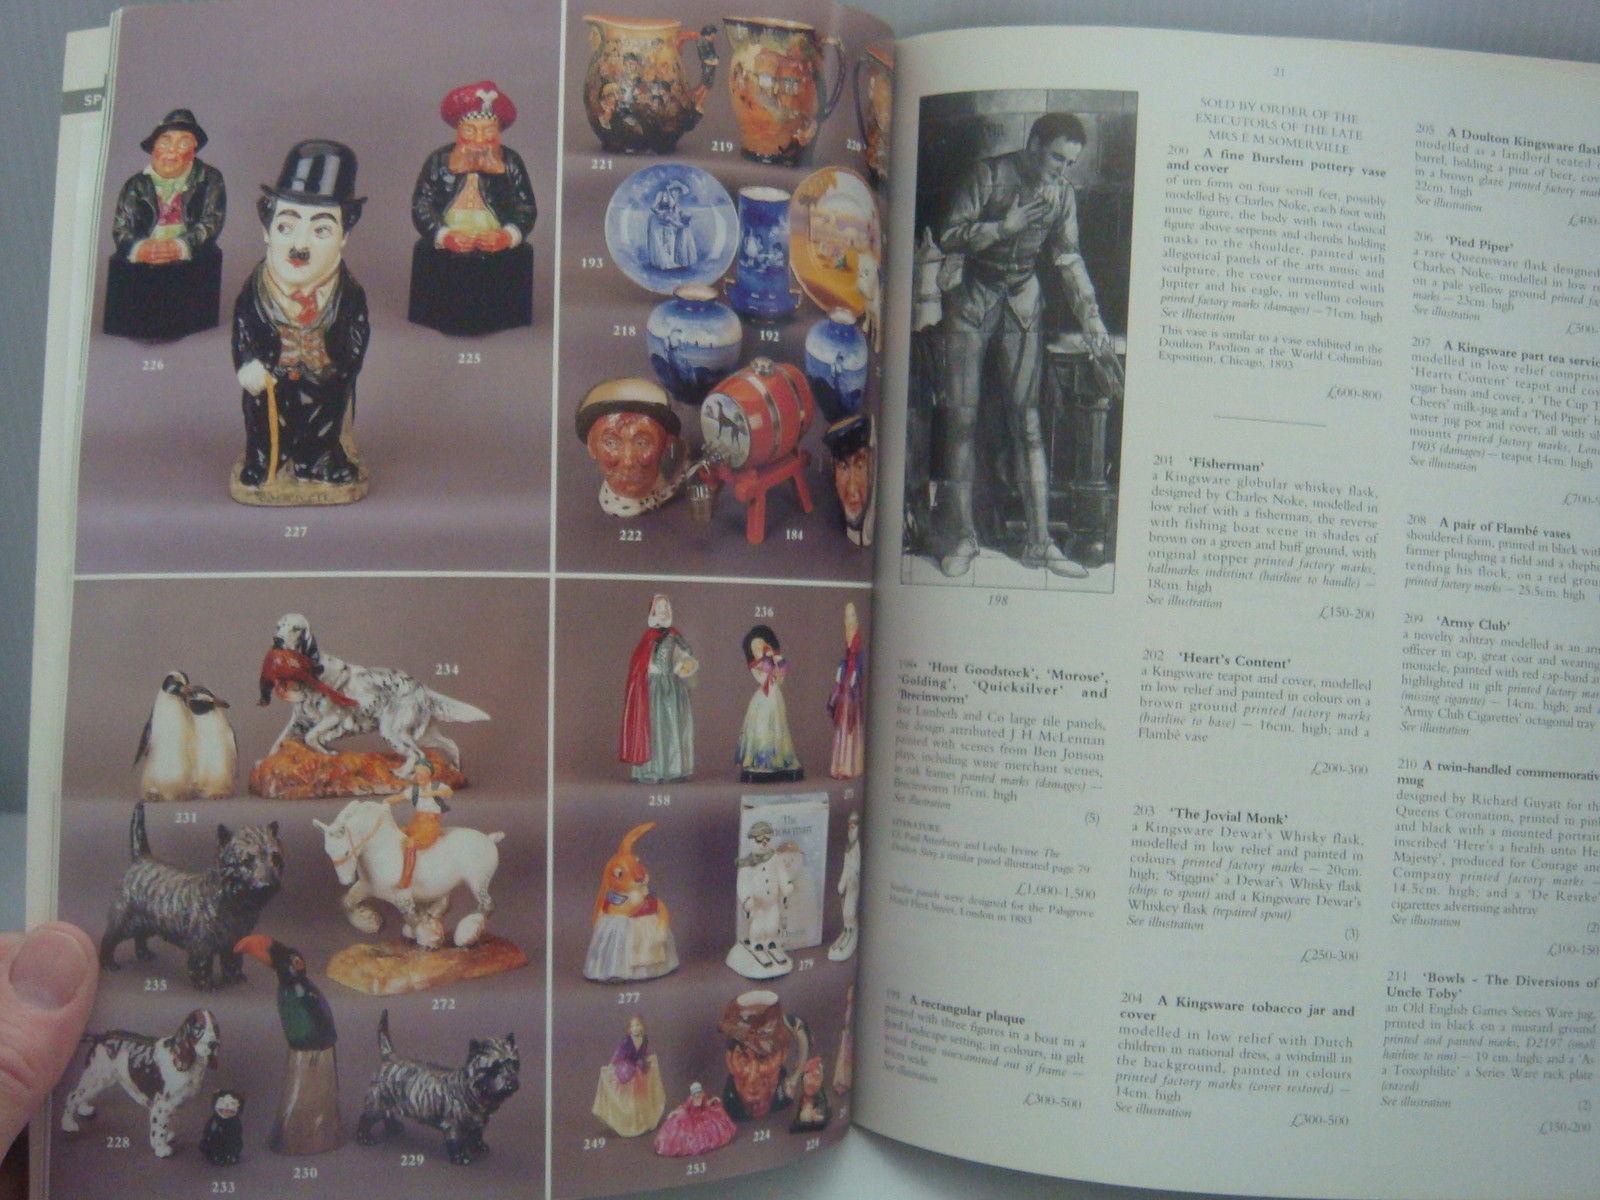 CHRISTIE'S AUCTION CATALOG 1997 CHINTZ, BESWICK, DOULTON, POOLE, CARLTON WARE